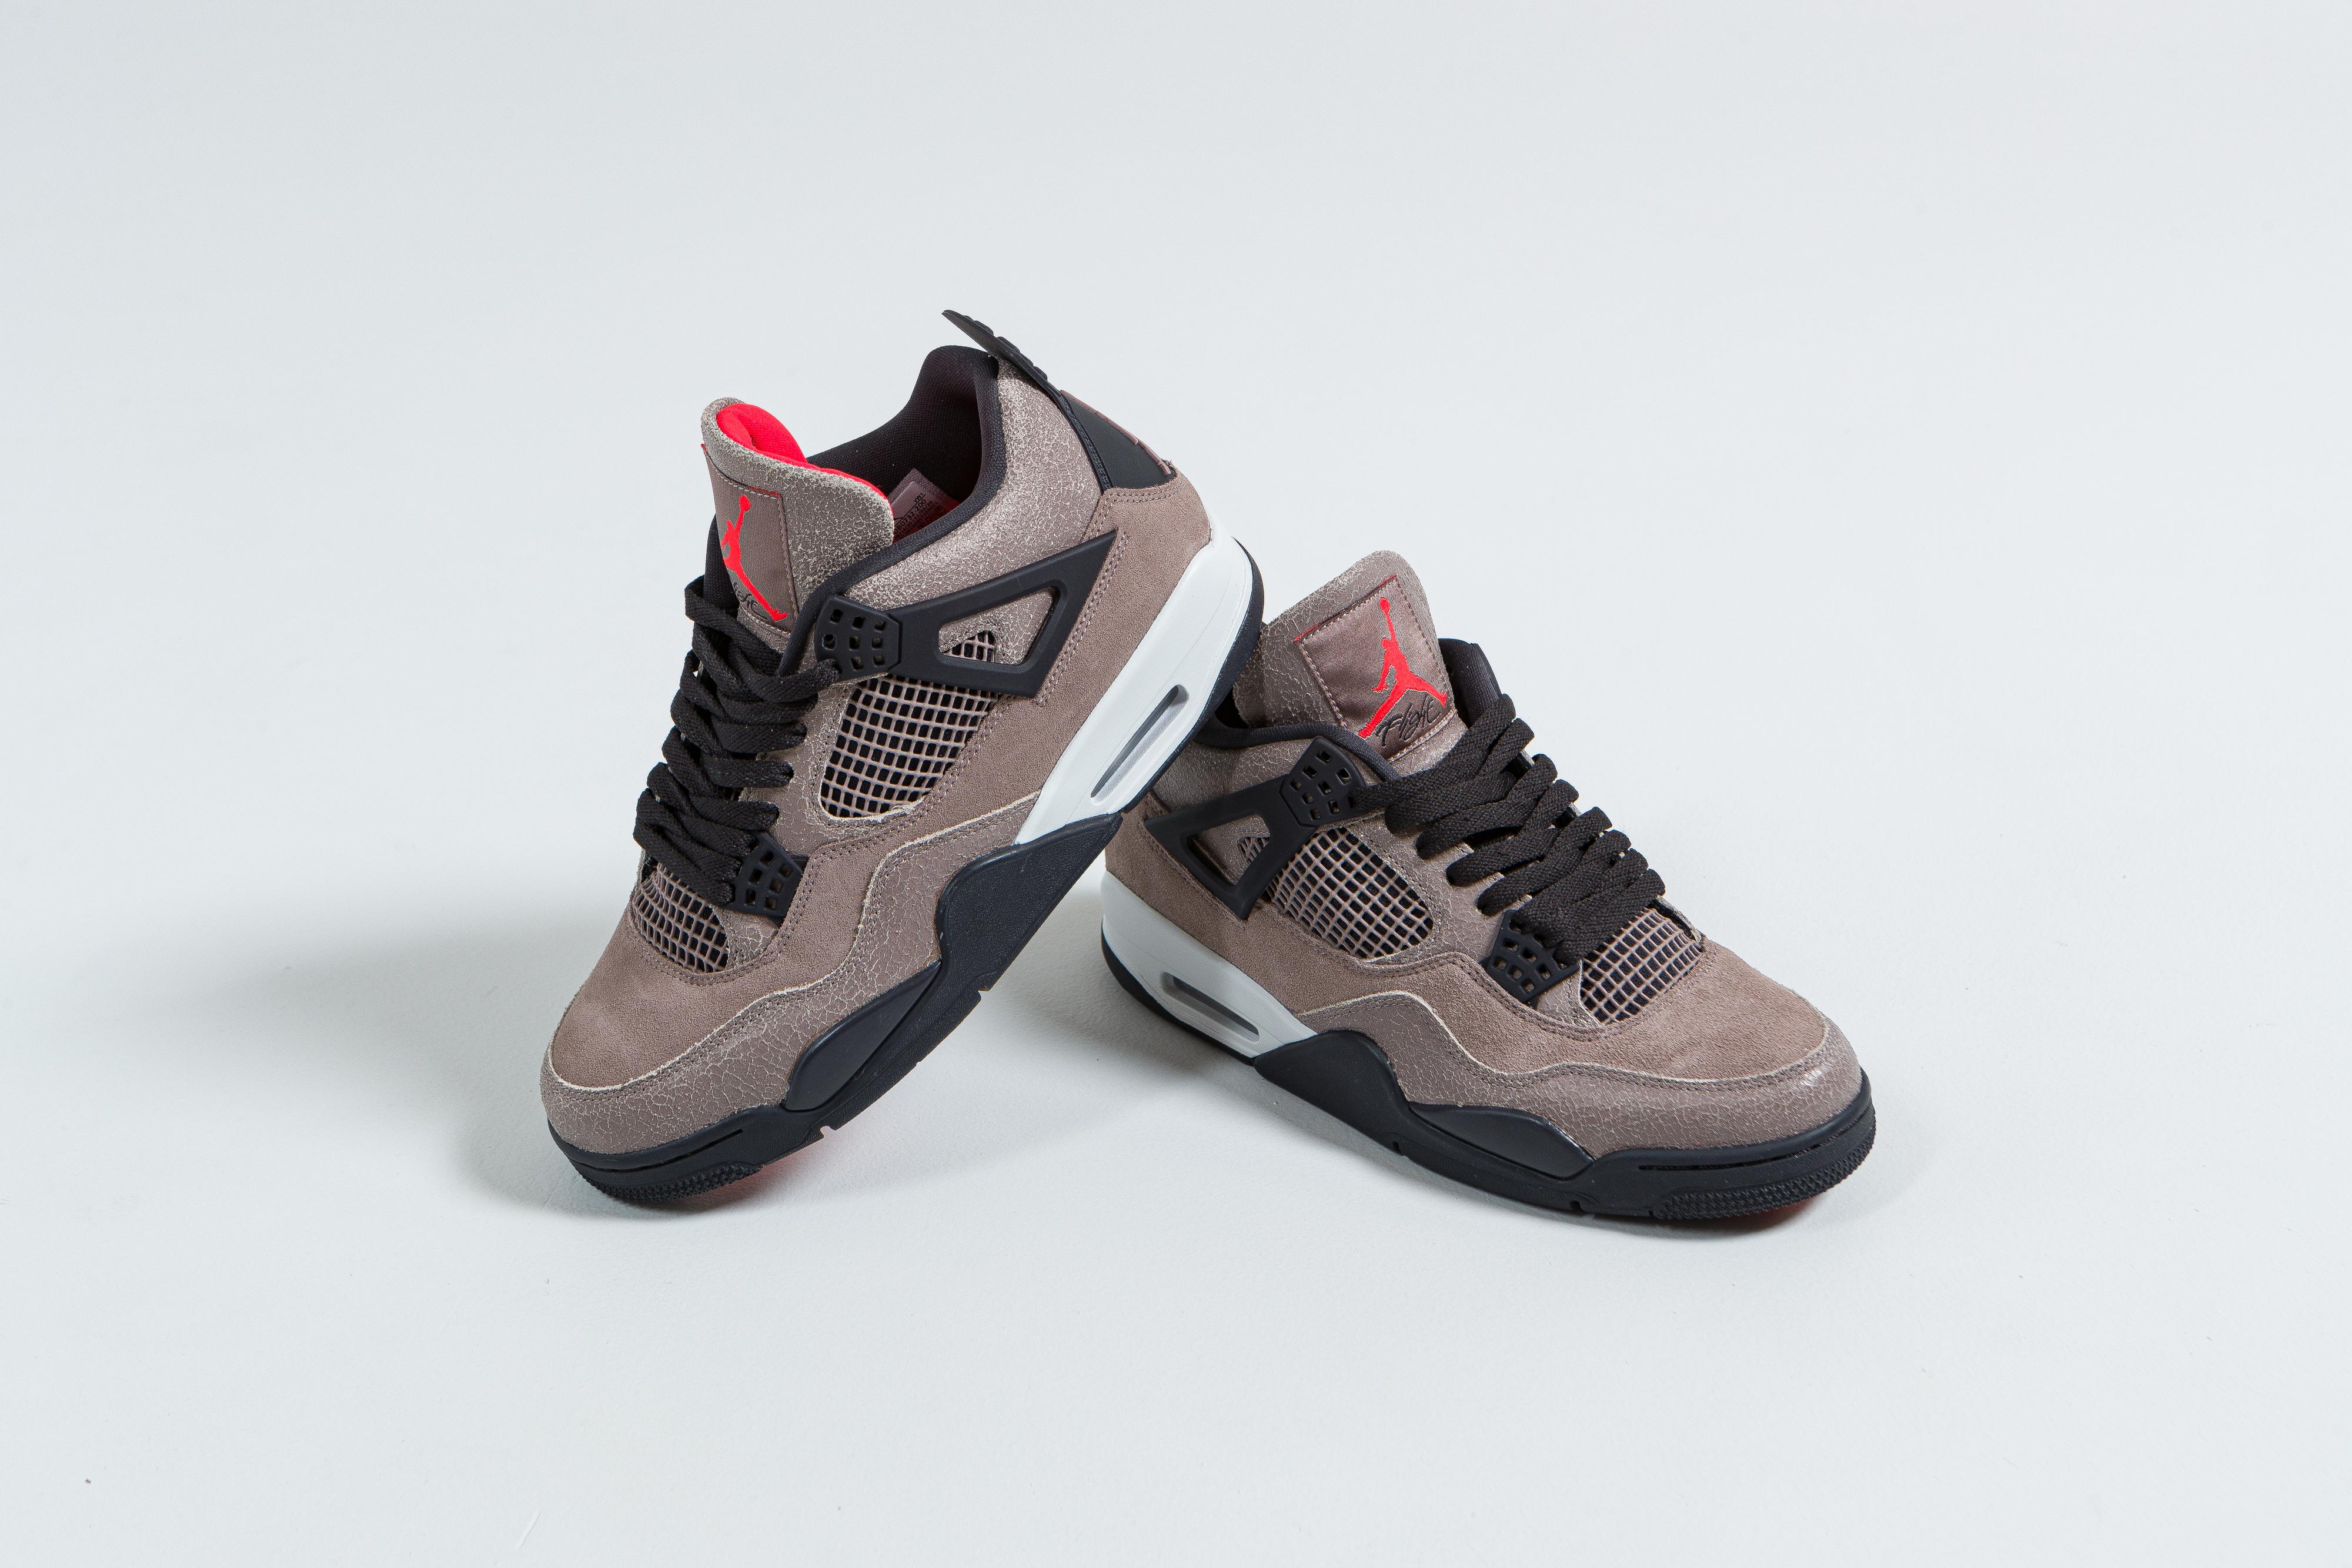 Jordan - Air Jordan 4 Retro - 'Taupe Haze' - Up There